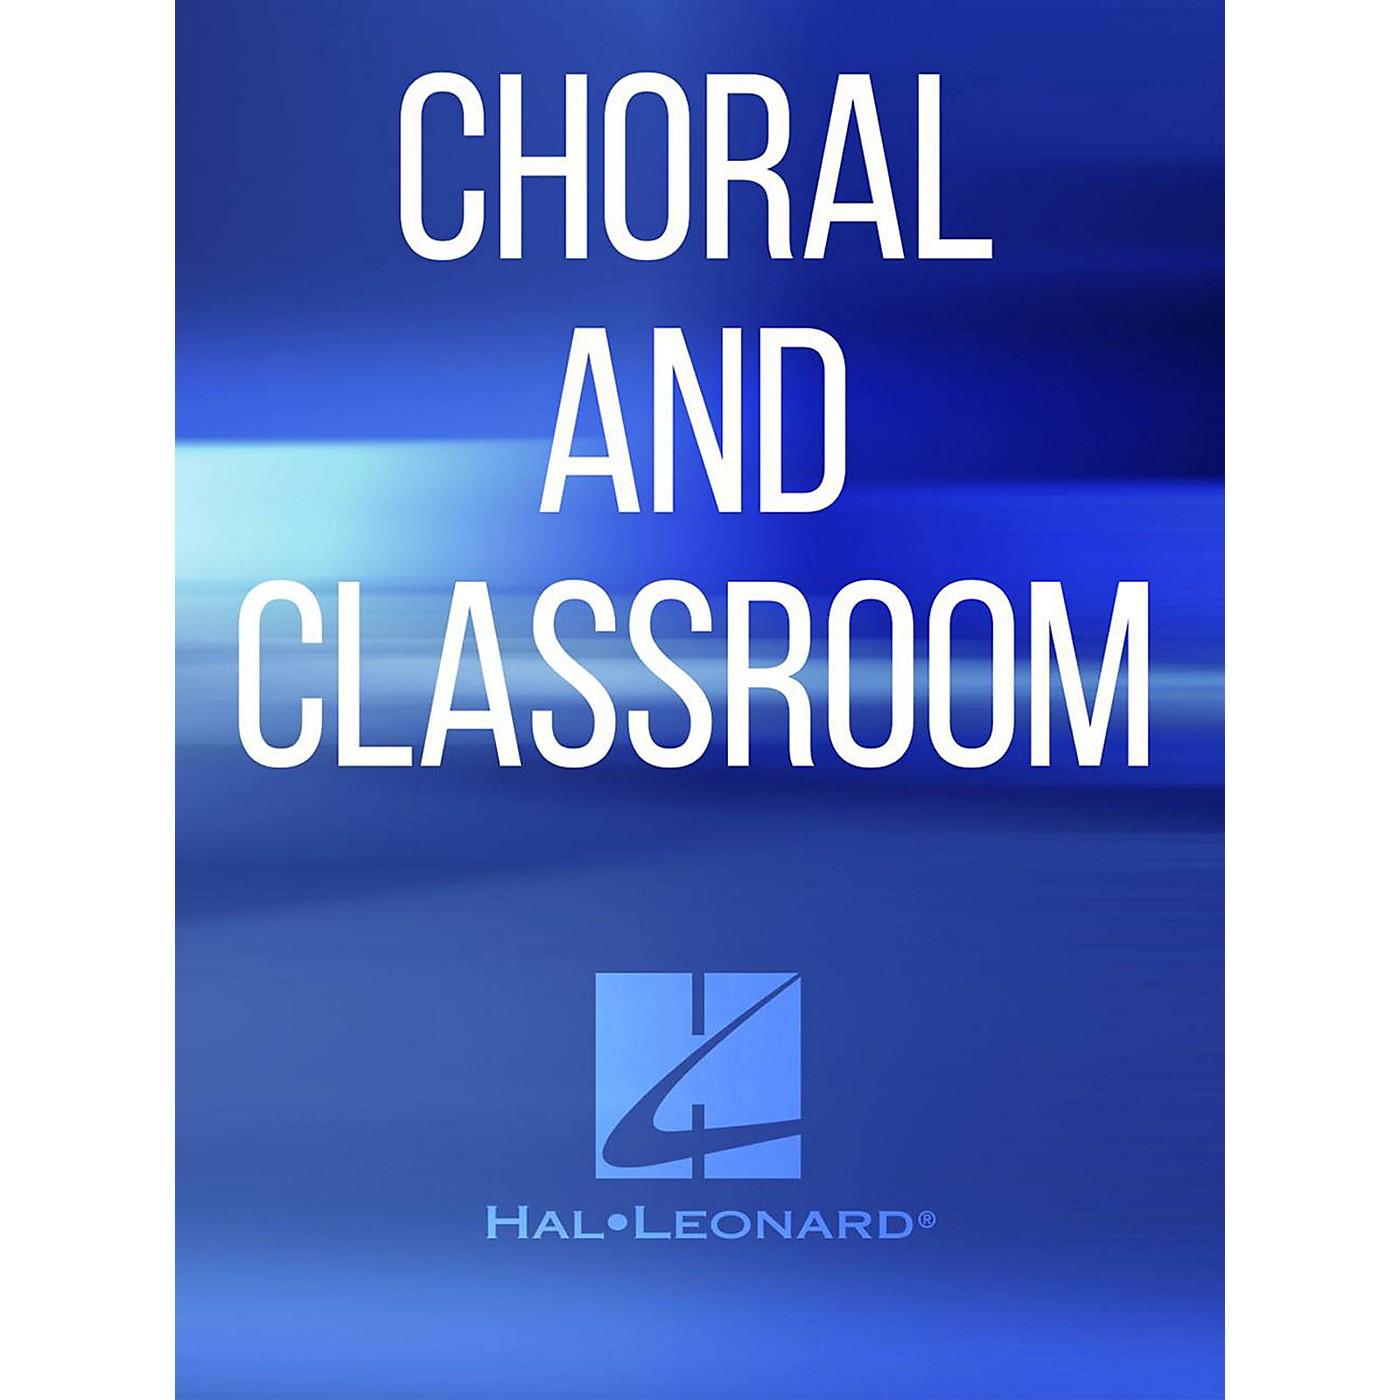 Hal Leonard Midnight Train to Georgia SAB by Gladys Knight & The Pips Arranged by Steve Zegree thumbnail